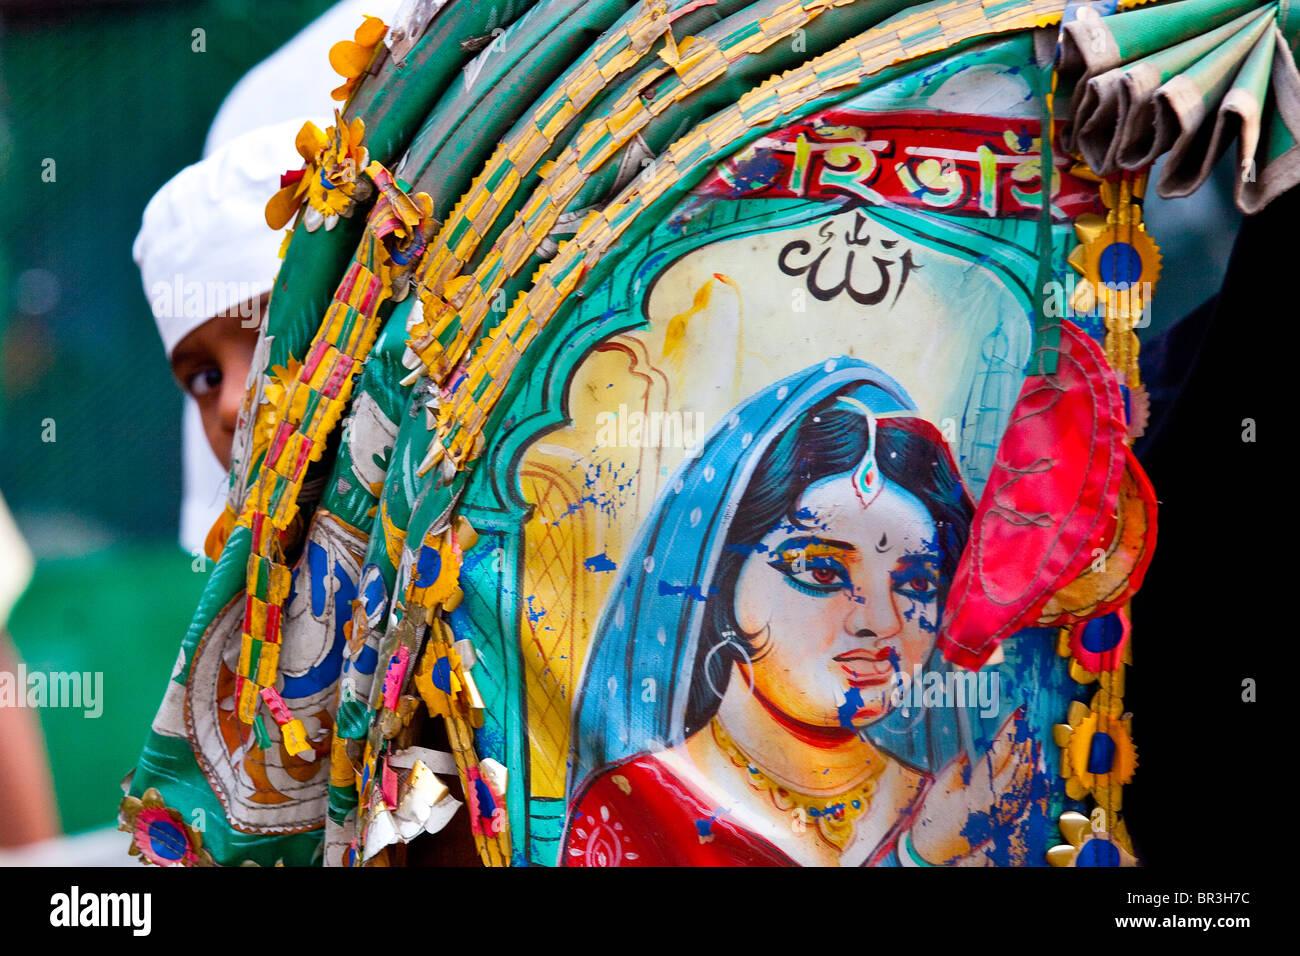 Boy looking back from a bicycle rickshaw in Dhaka, Bangladesh - Stock Image